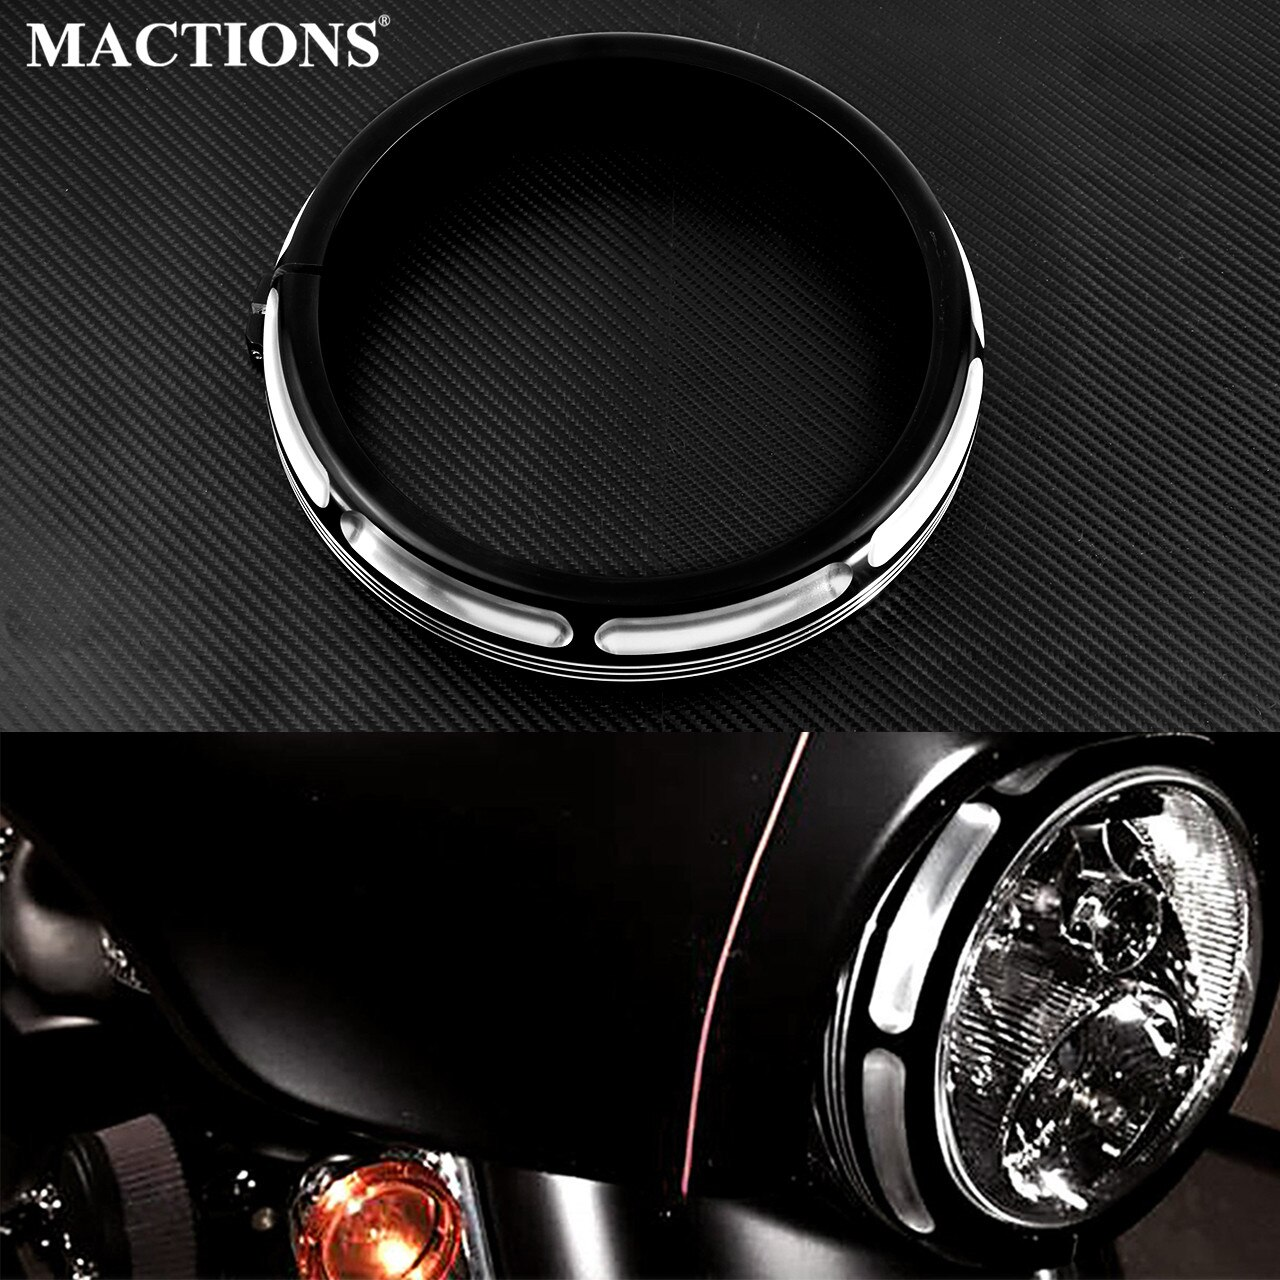 "Motorcycle 7"" Burst Headlamp Headlight Trim Ring For Harley Touring Street Glide Road King Electra Tri Glide FLHR FLHX FLTXR"